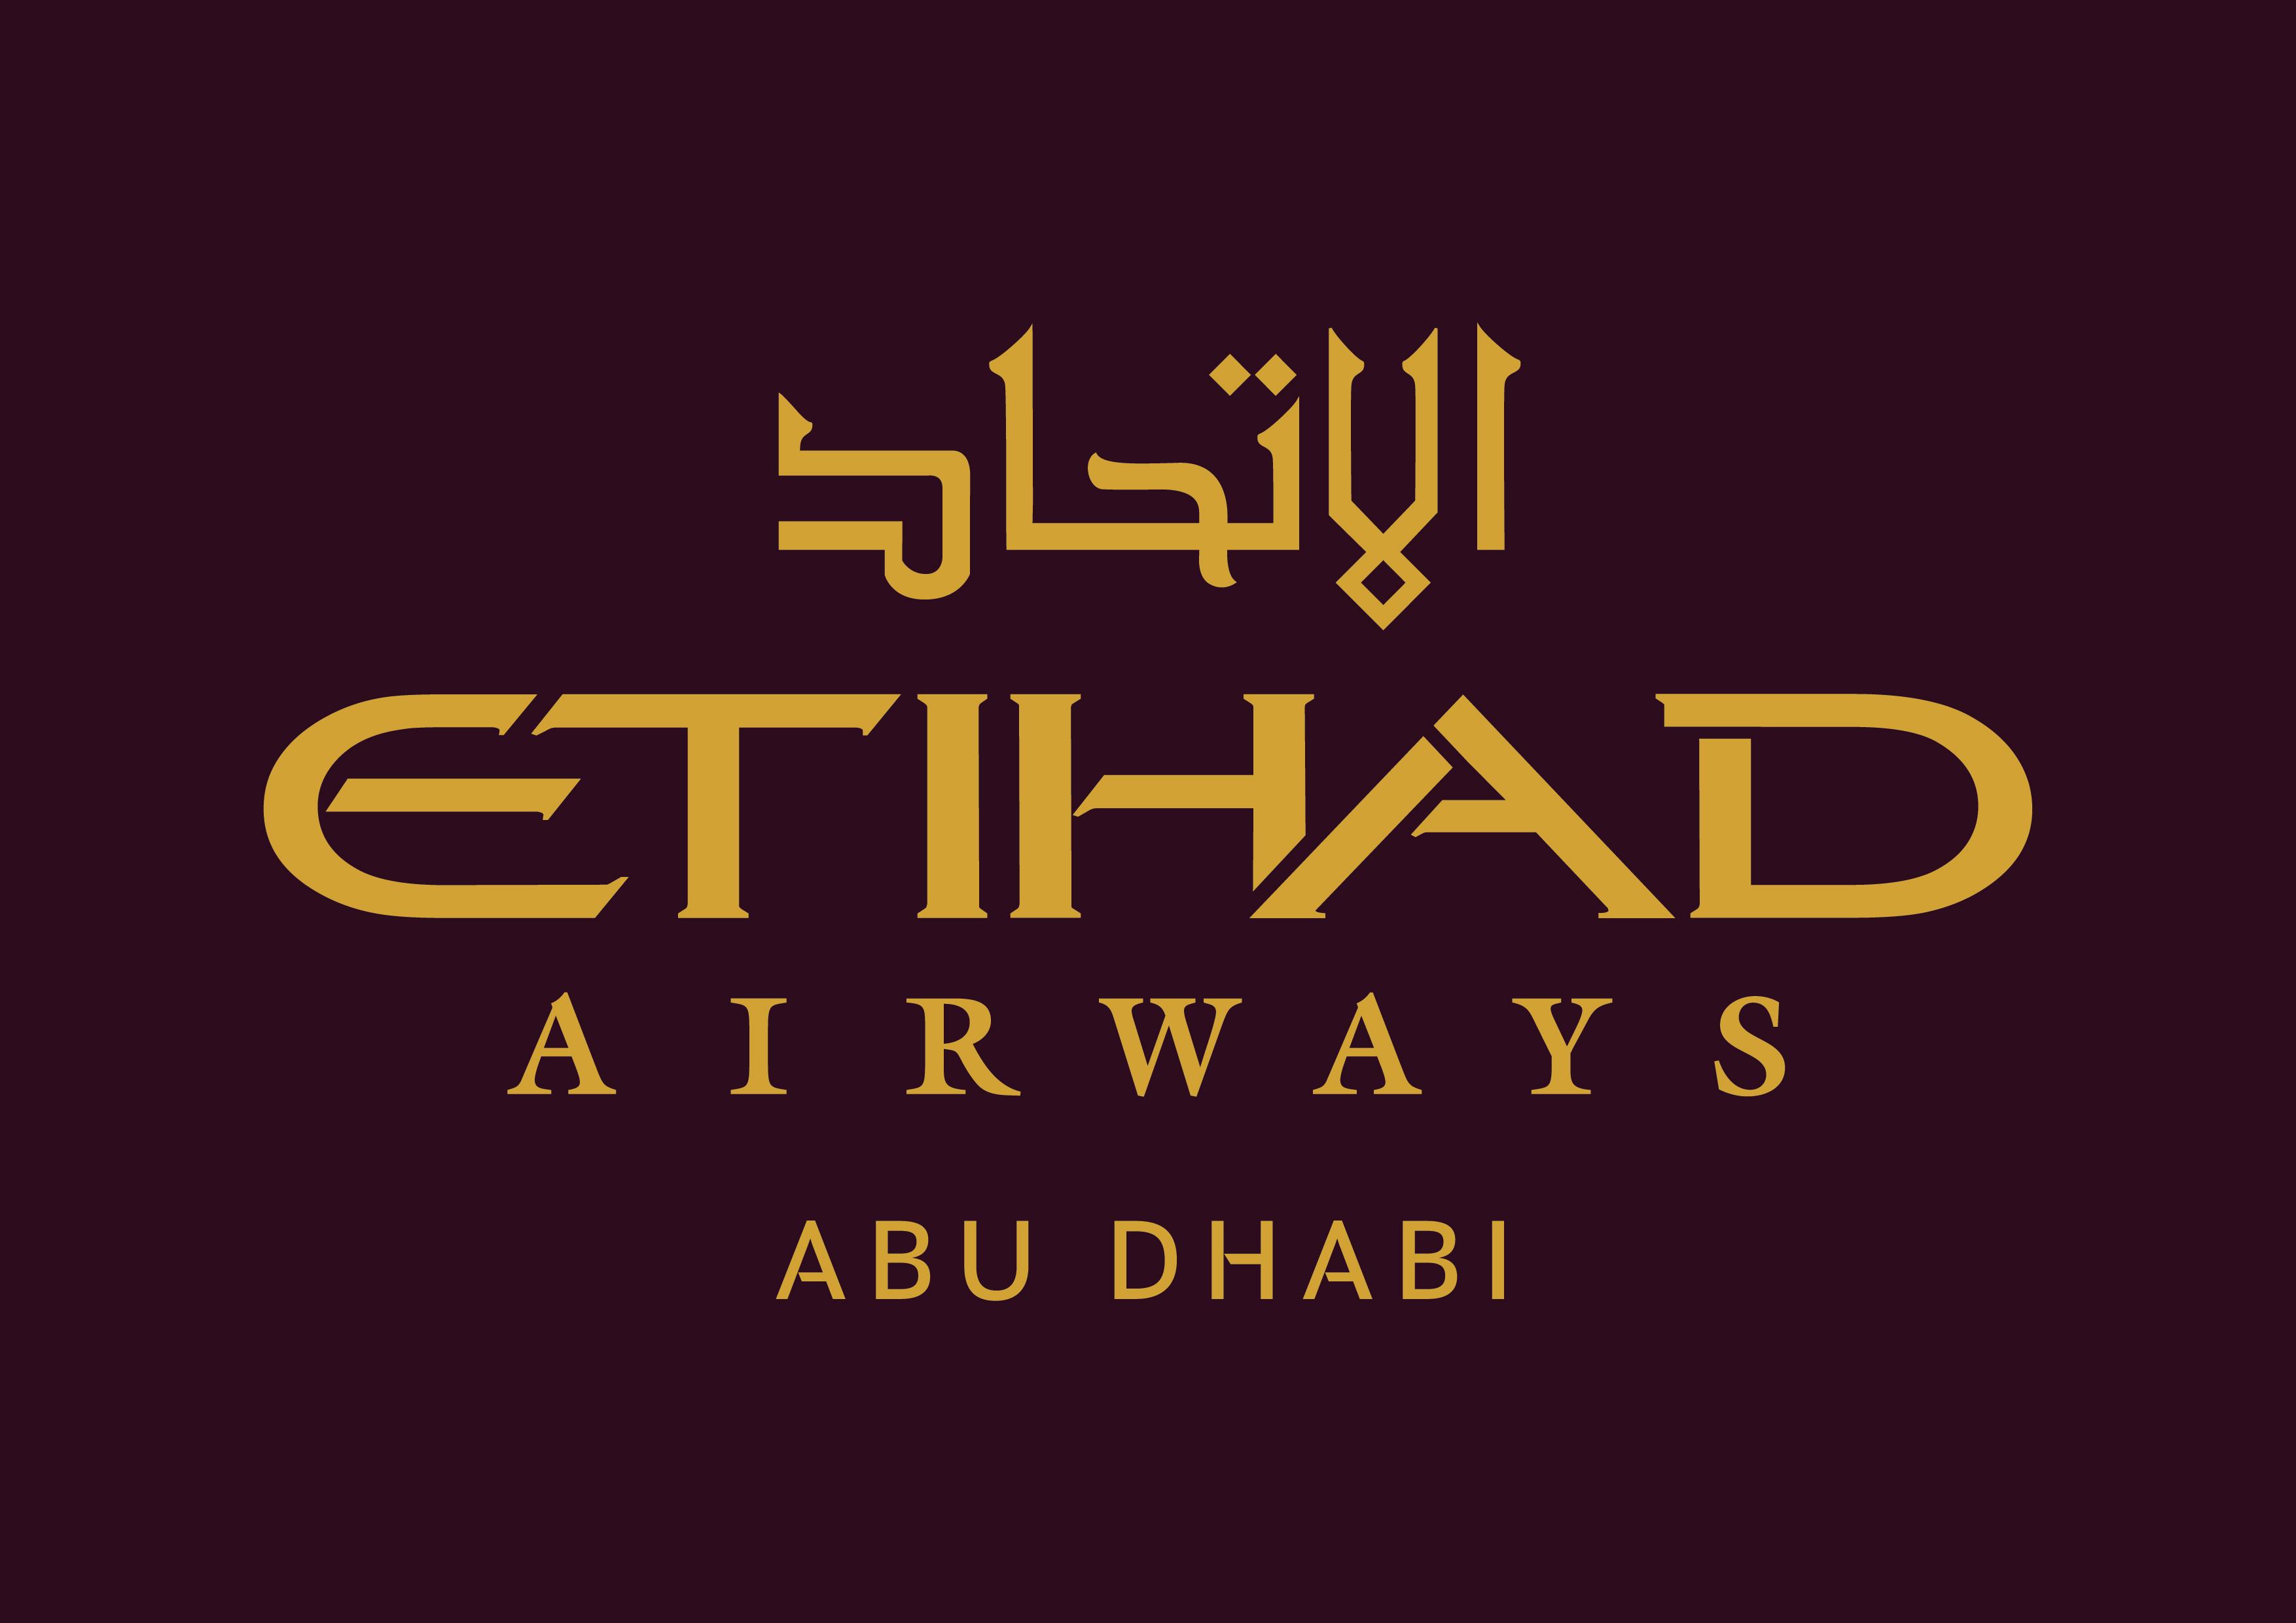 Etihad Airways - Wikipedia, the free encyclopedia